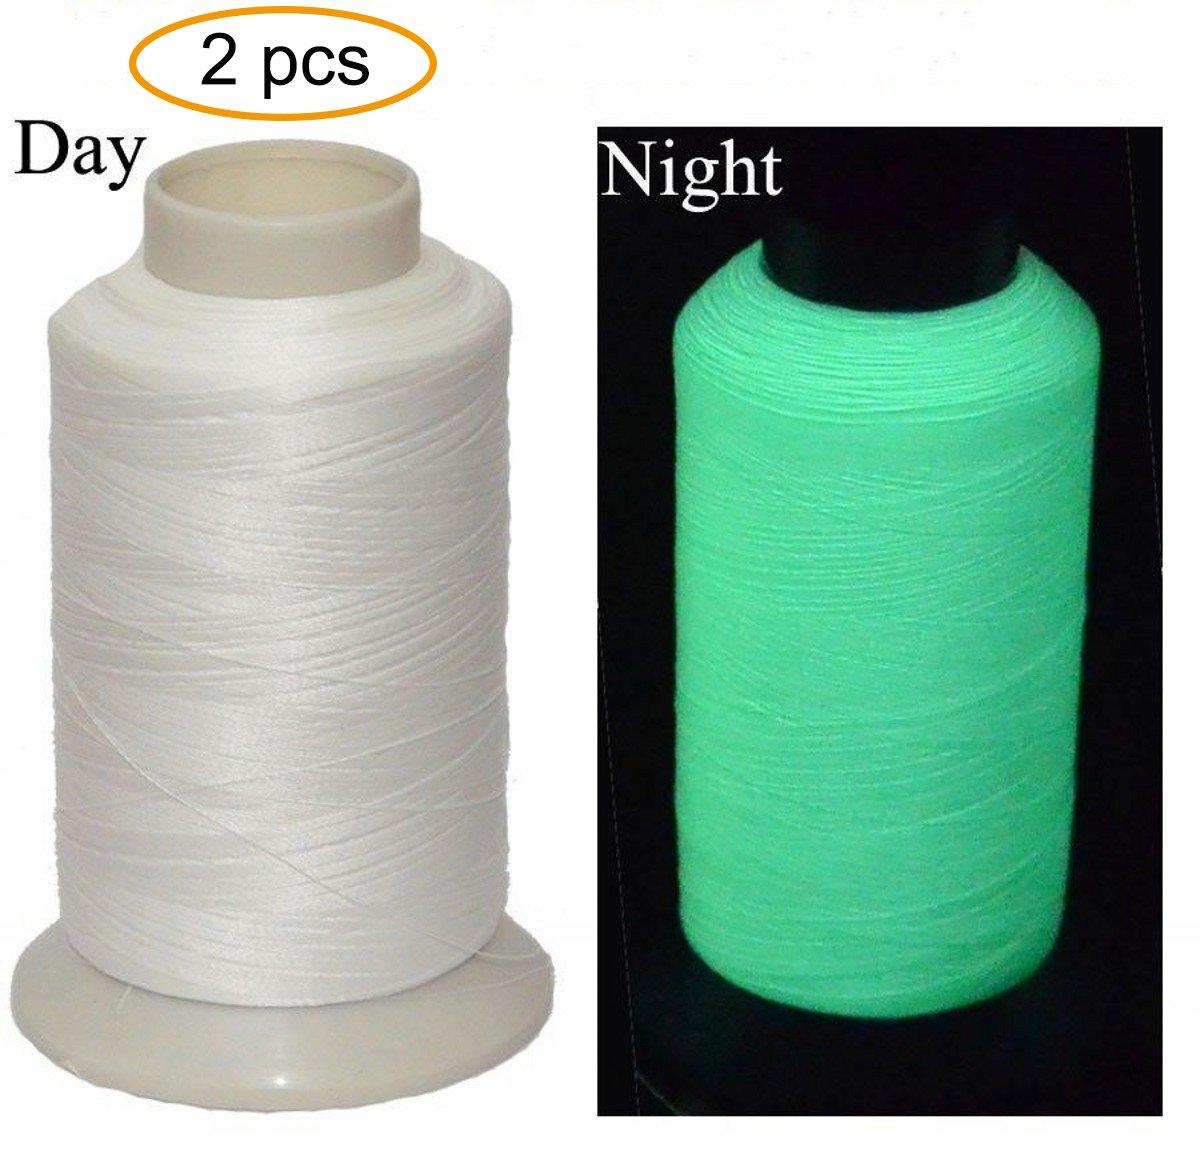 Bettli 3300Yards Glow In The Dark Embroidery Thread (White) Bokesi B-GIDTW1